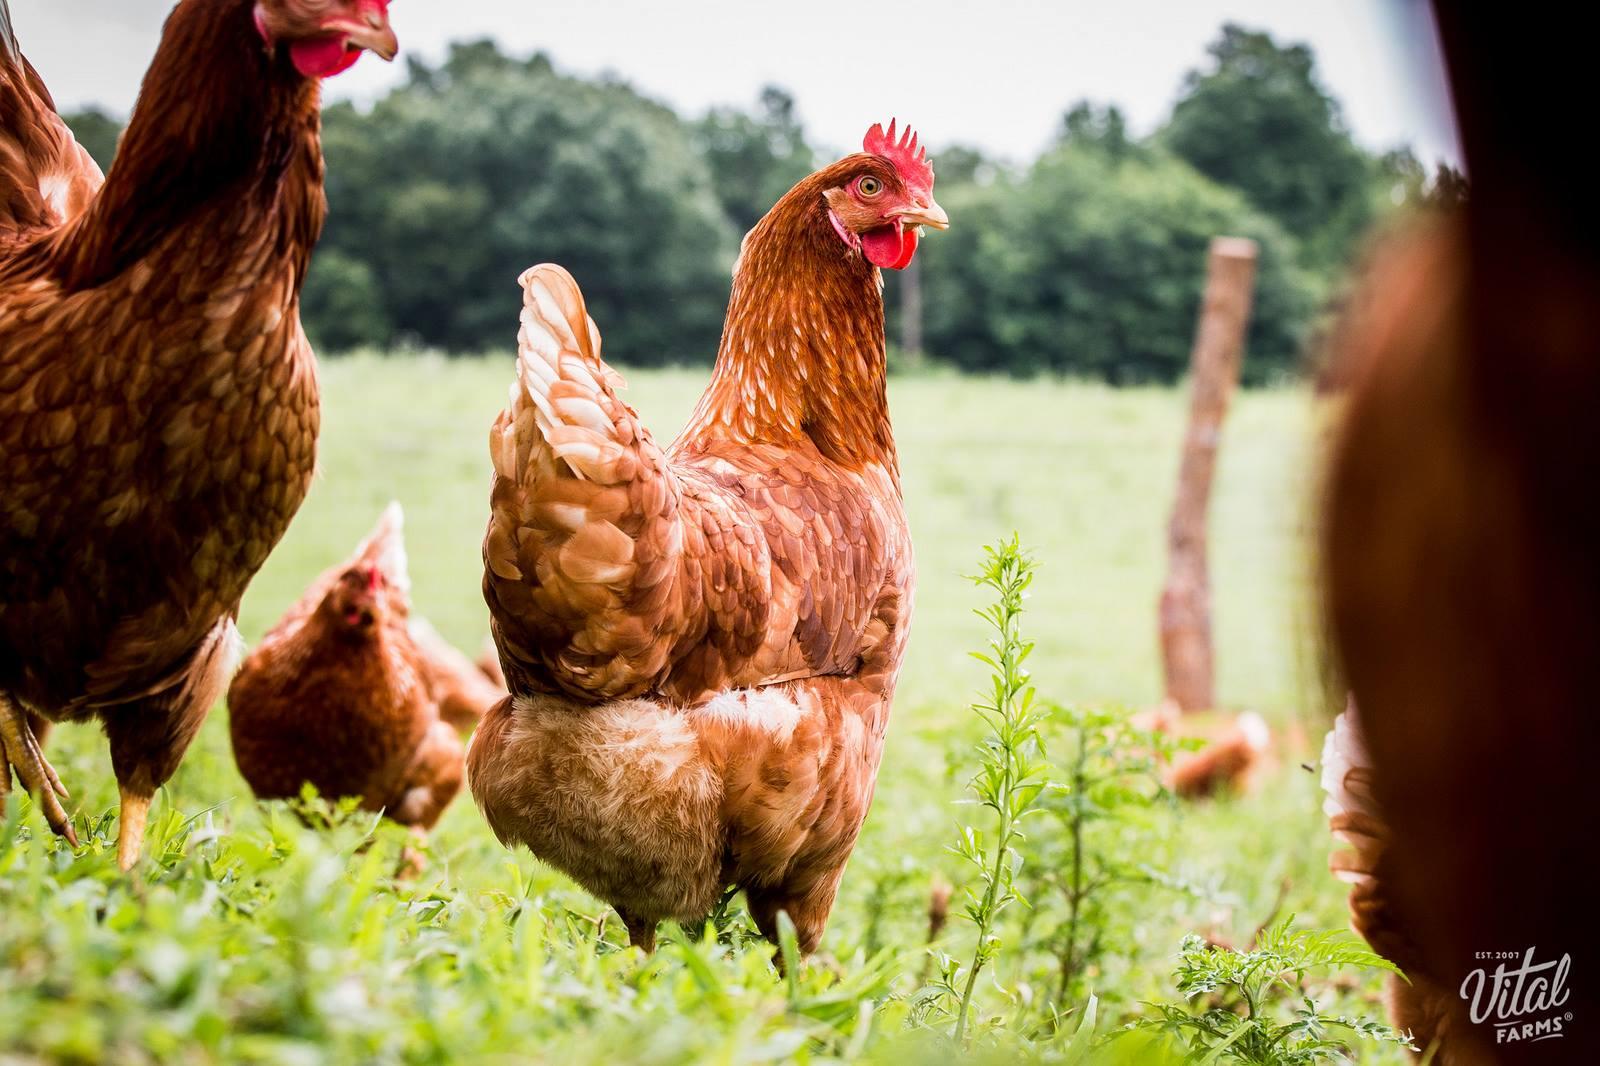 Vital Farms girls